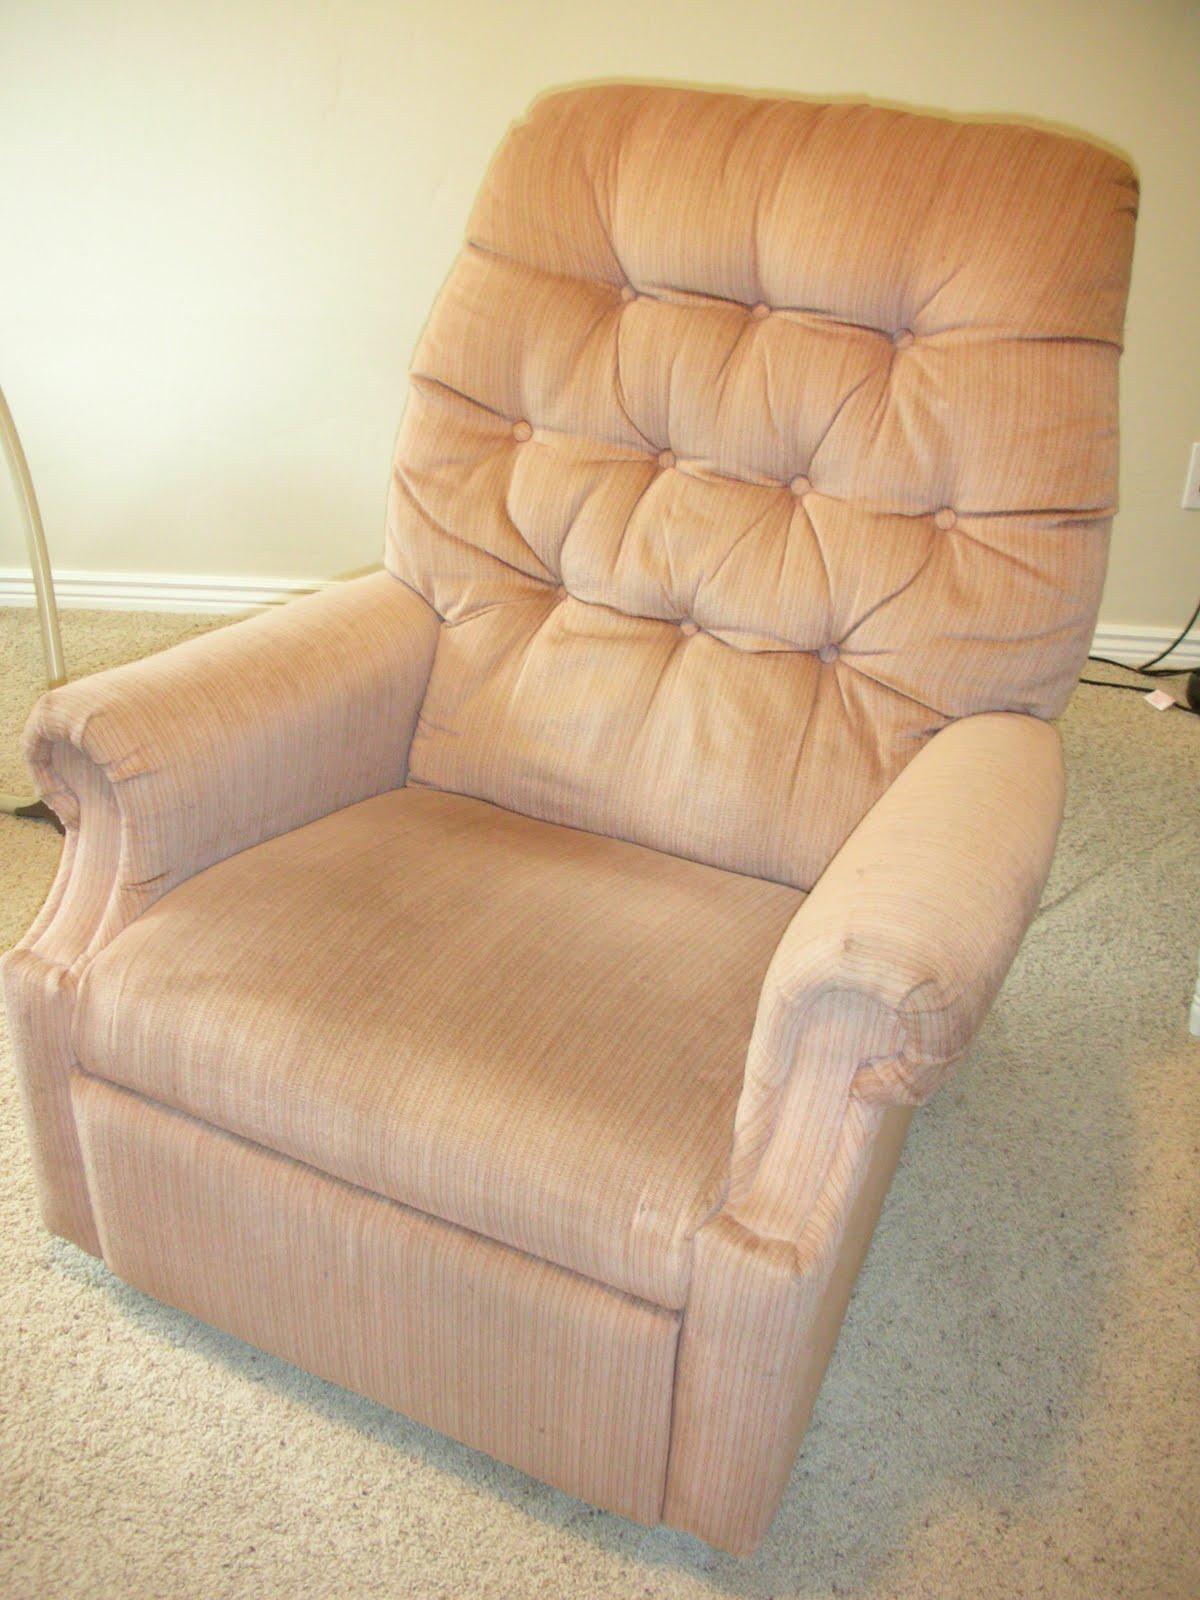 Lazy Boy Recliner Chair Ergonomic Back Do It Yourself Divas Diy Reupholster An Old La Z